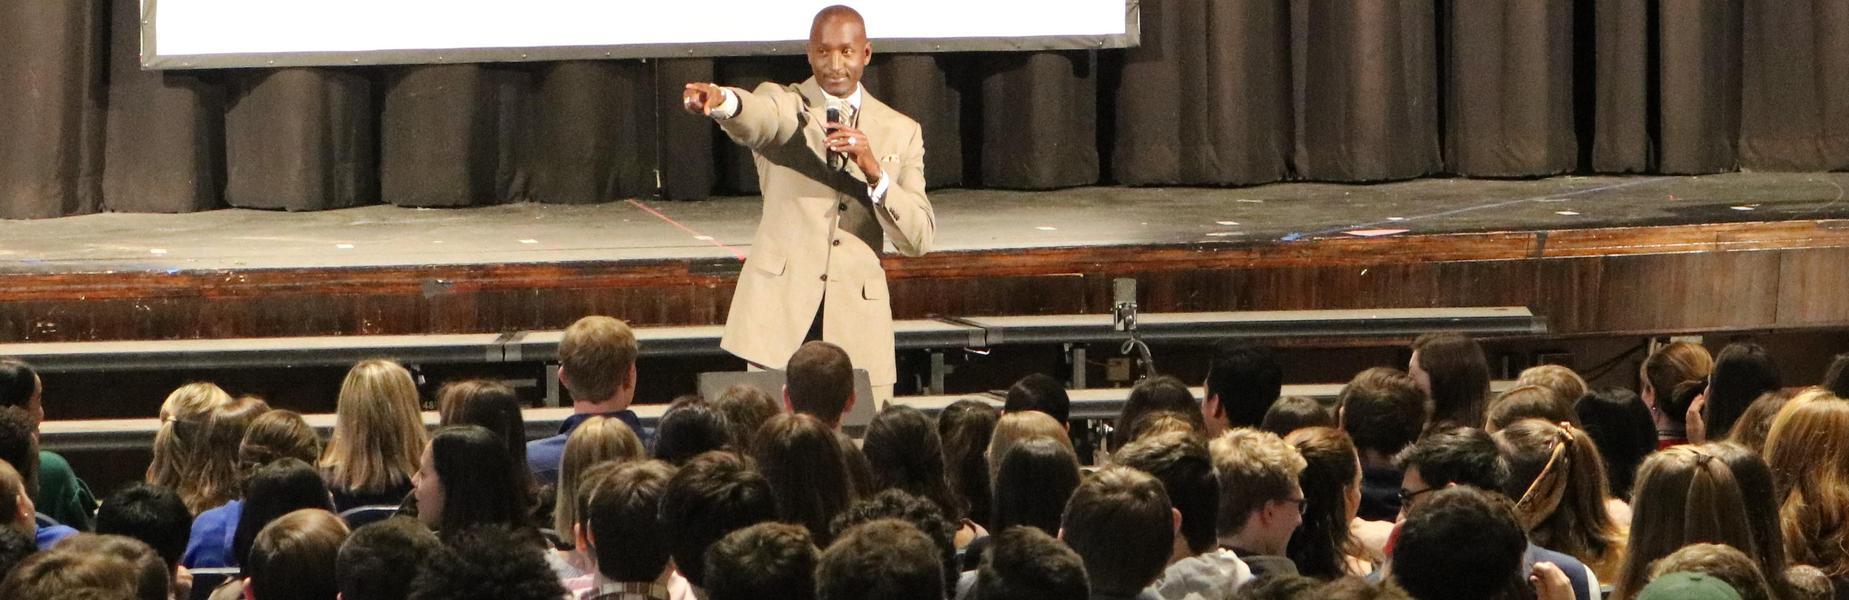 Dr. Randal Pinkett visits WHS on Feb 1 for an inspiring Black History Month assembly.